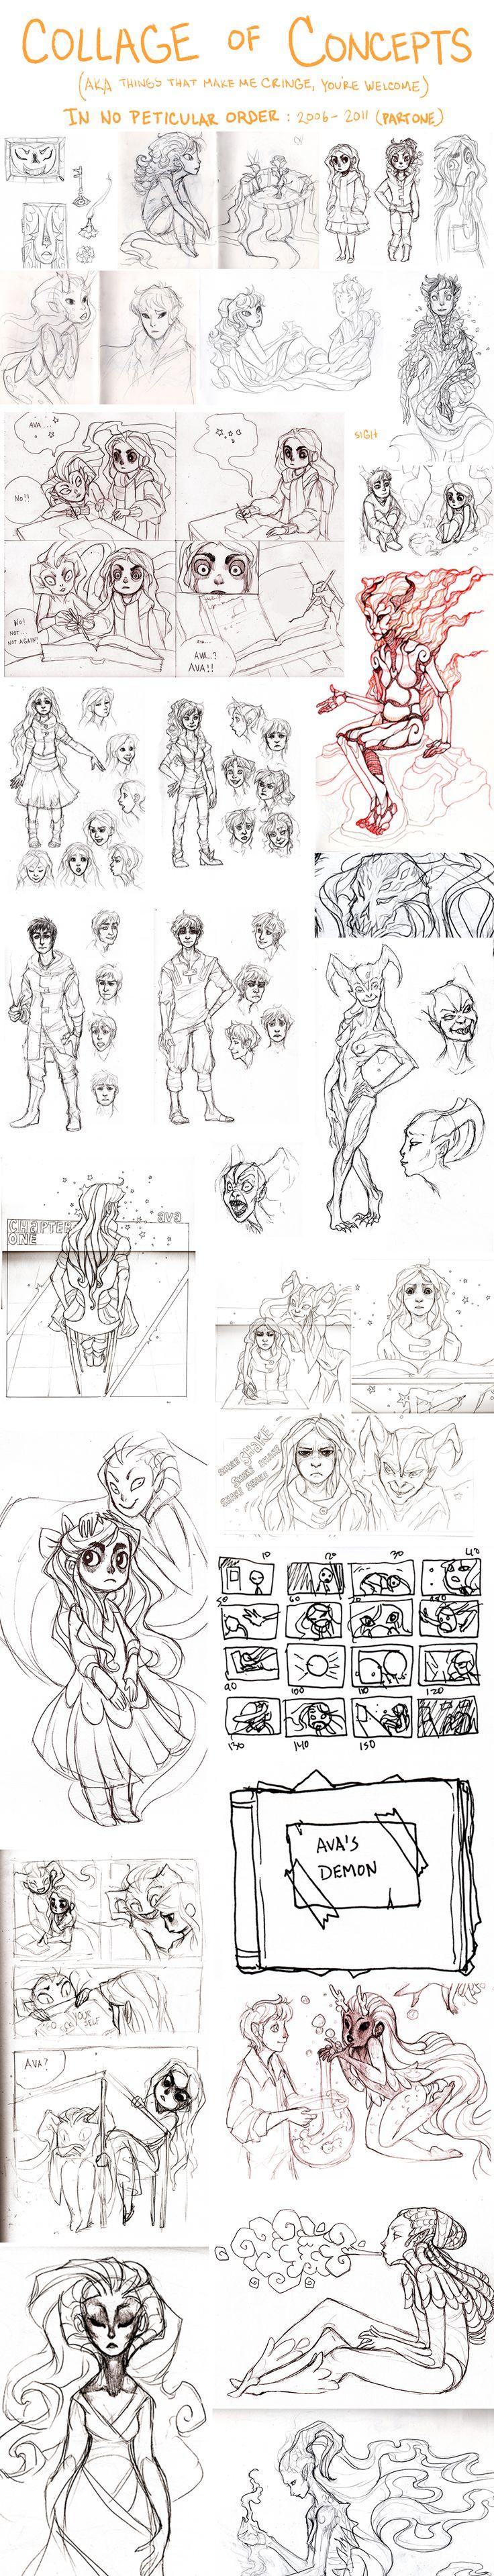 Anime Drawing Ideas Generator Bestchristmasdeals Org